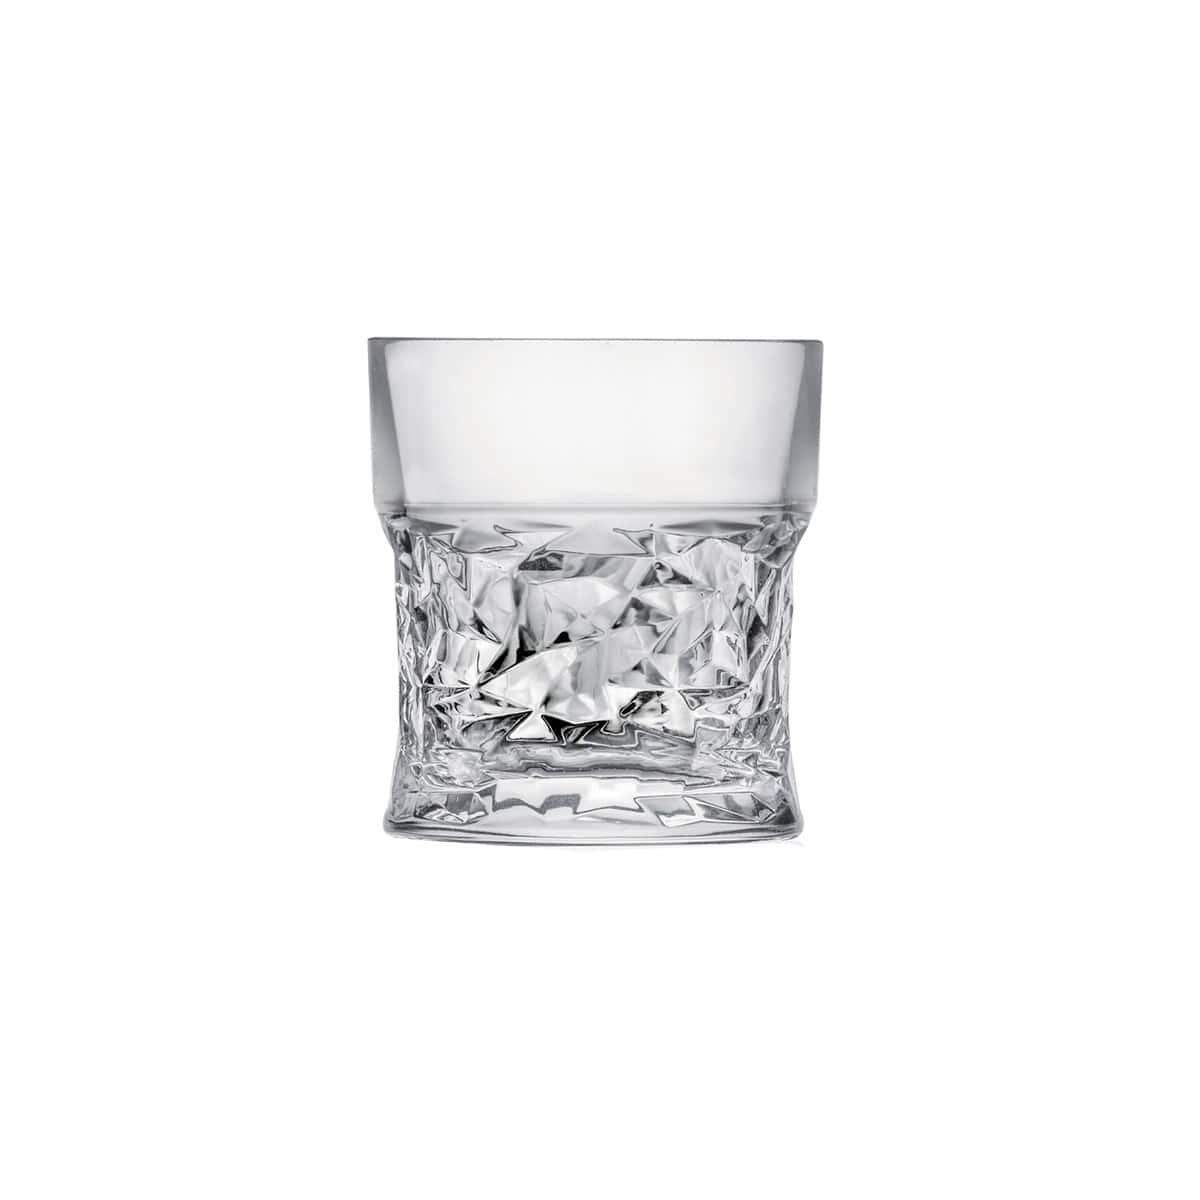 Набор для виски Mixology RCR Cristalleria Italiana (6 шт)